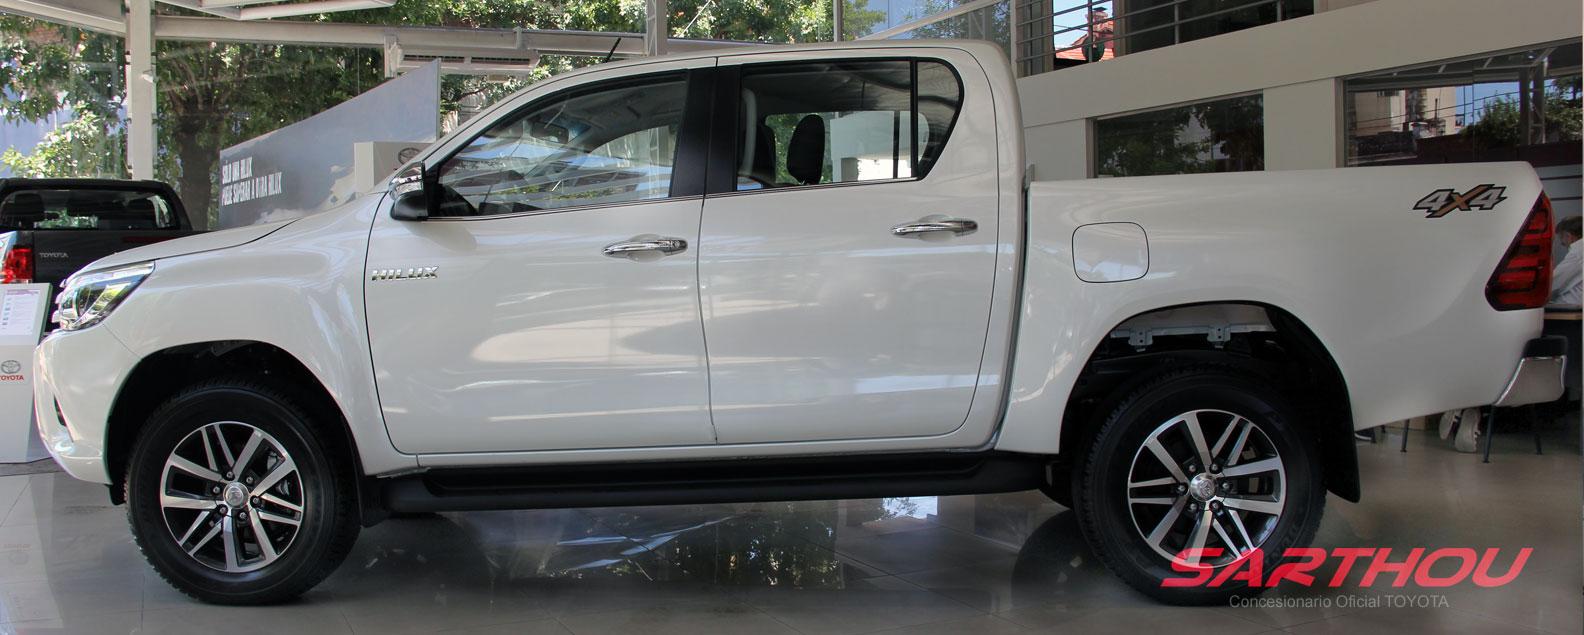 Toyota Hilux - Concesionario Sarthou